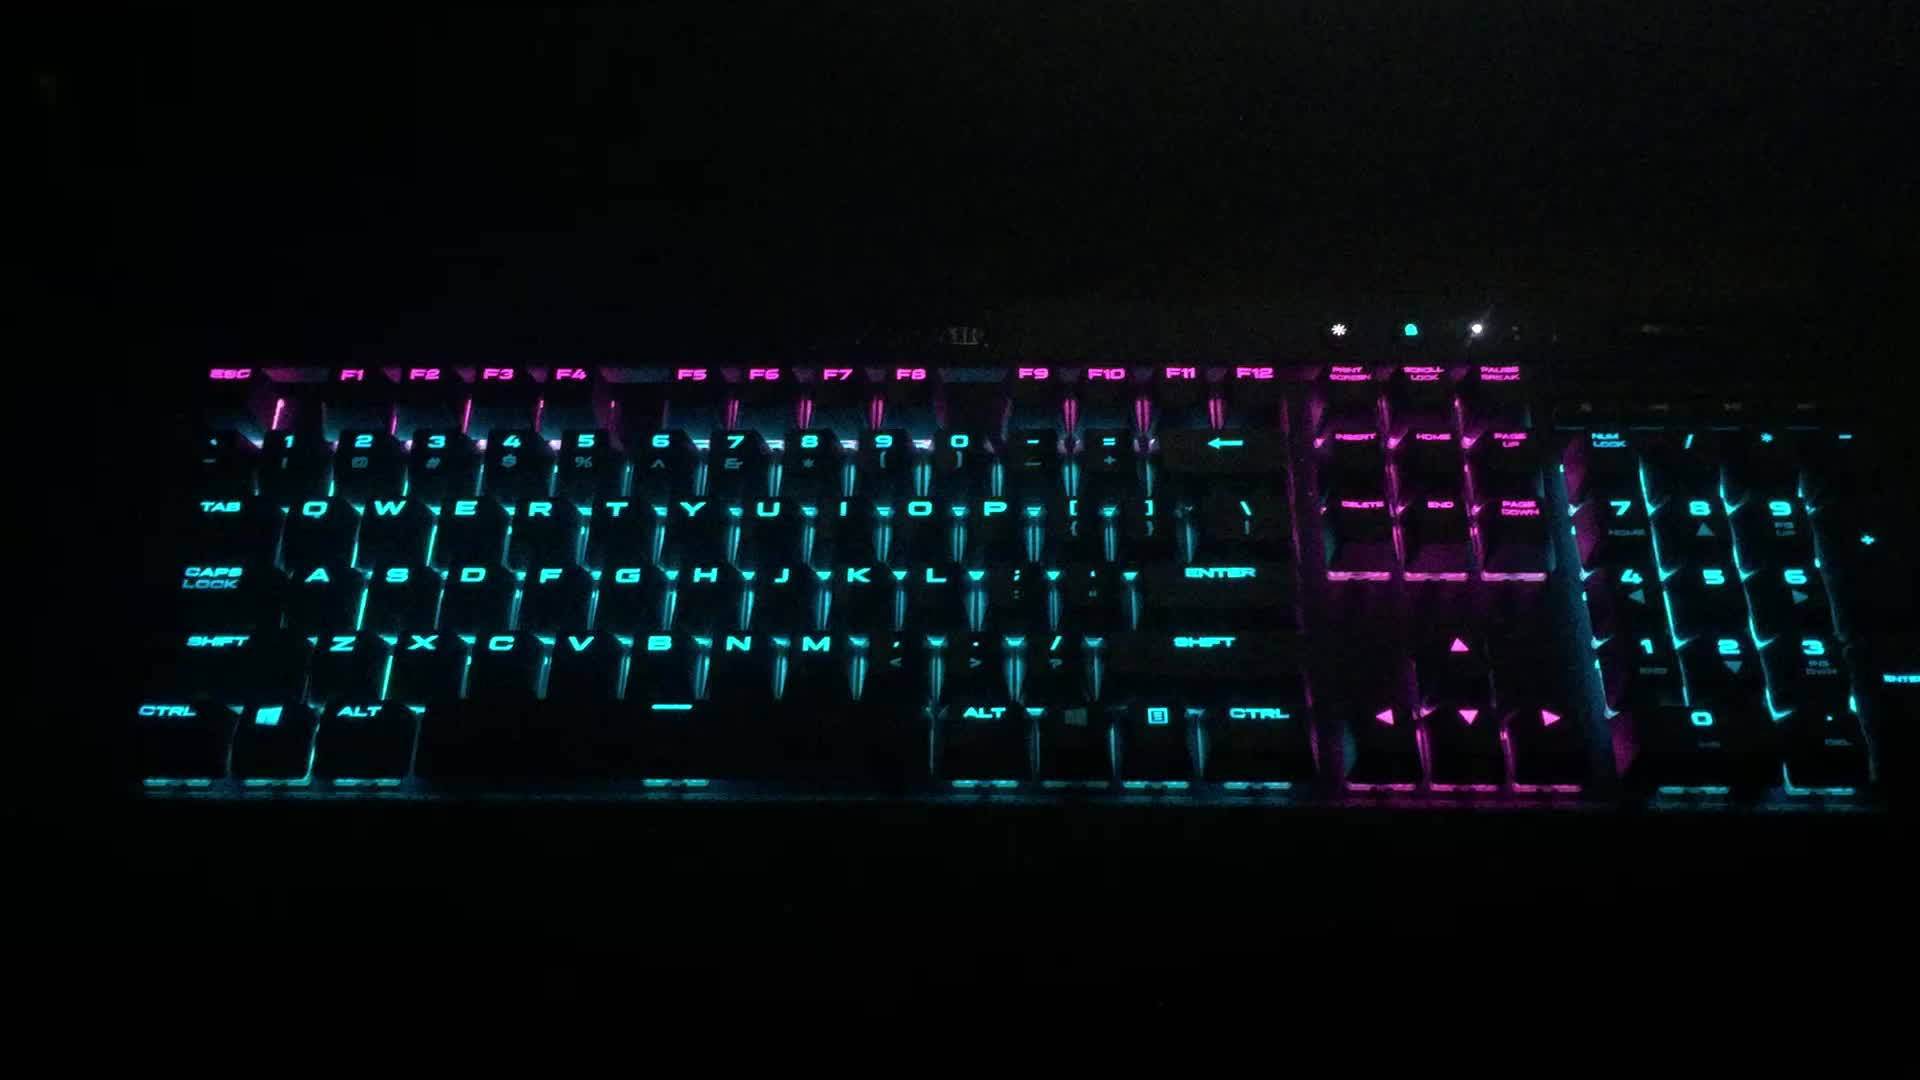 Keybaord, Outrun, Outrun Keyboard GIFs